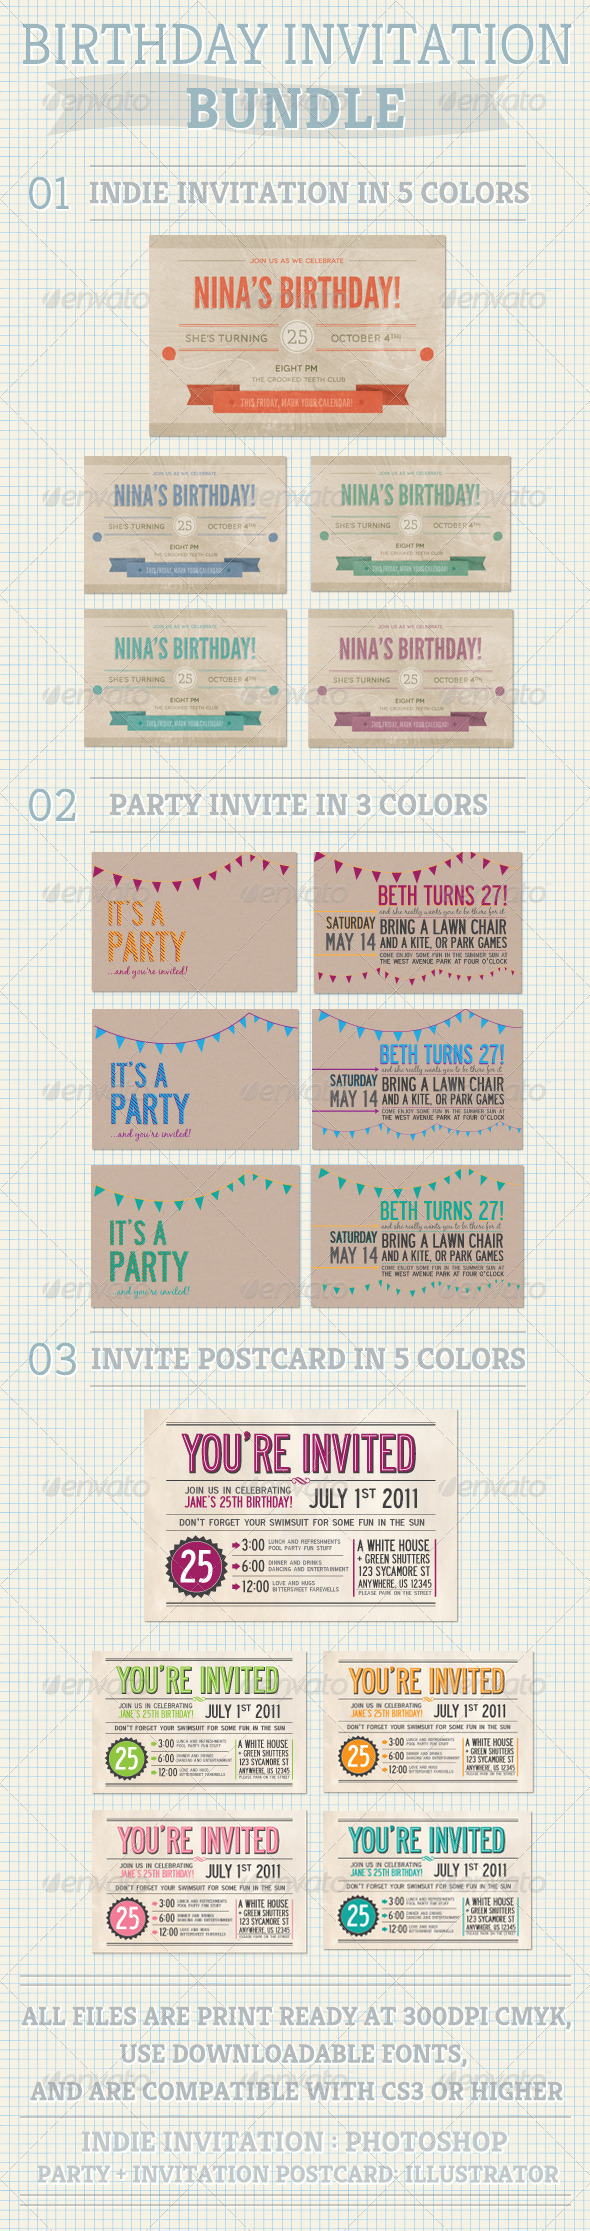 GraphicRiver Birthday Invitation Bundle 654460